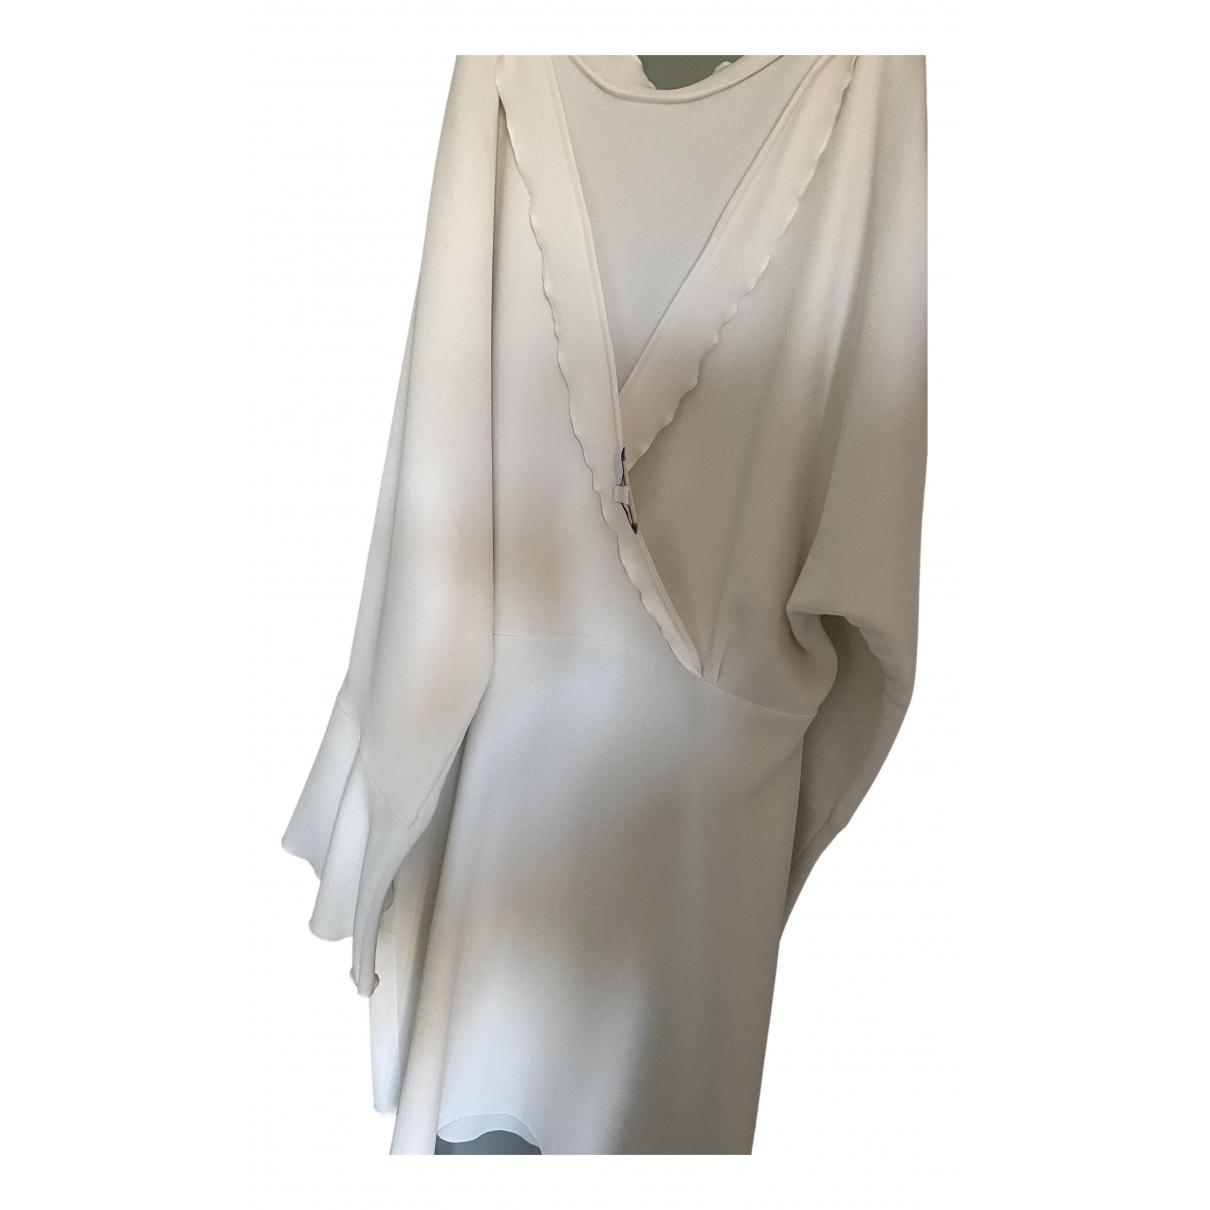 Iro - Robe Spring Summer 2020 pour femme en soie - blanc